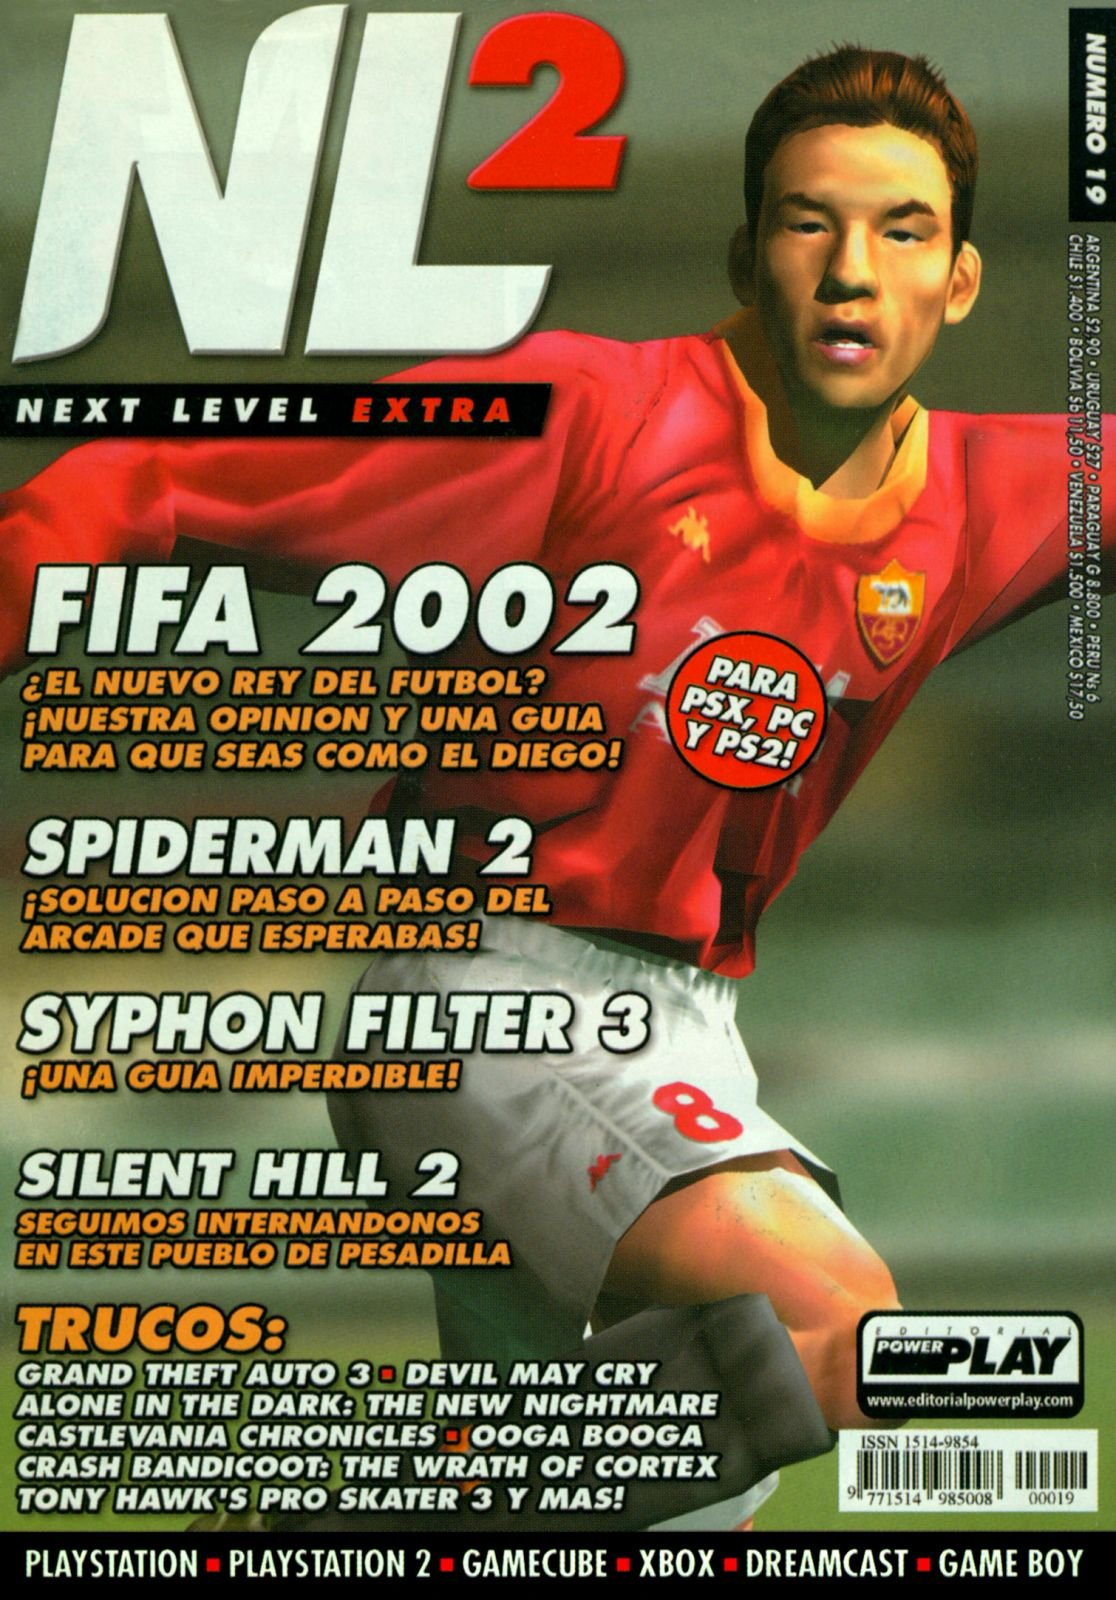 Next Level Extra 19 November 2001